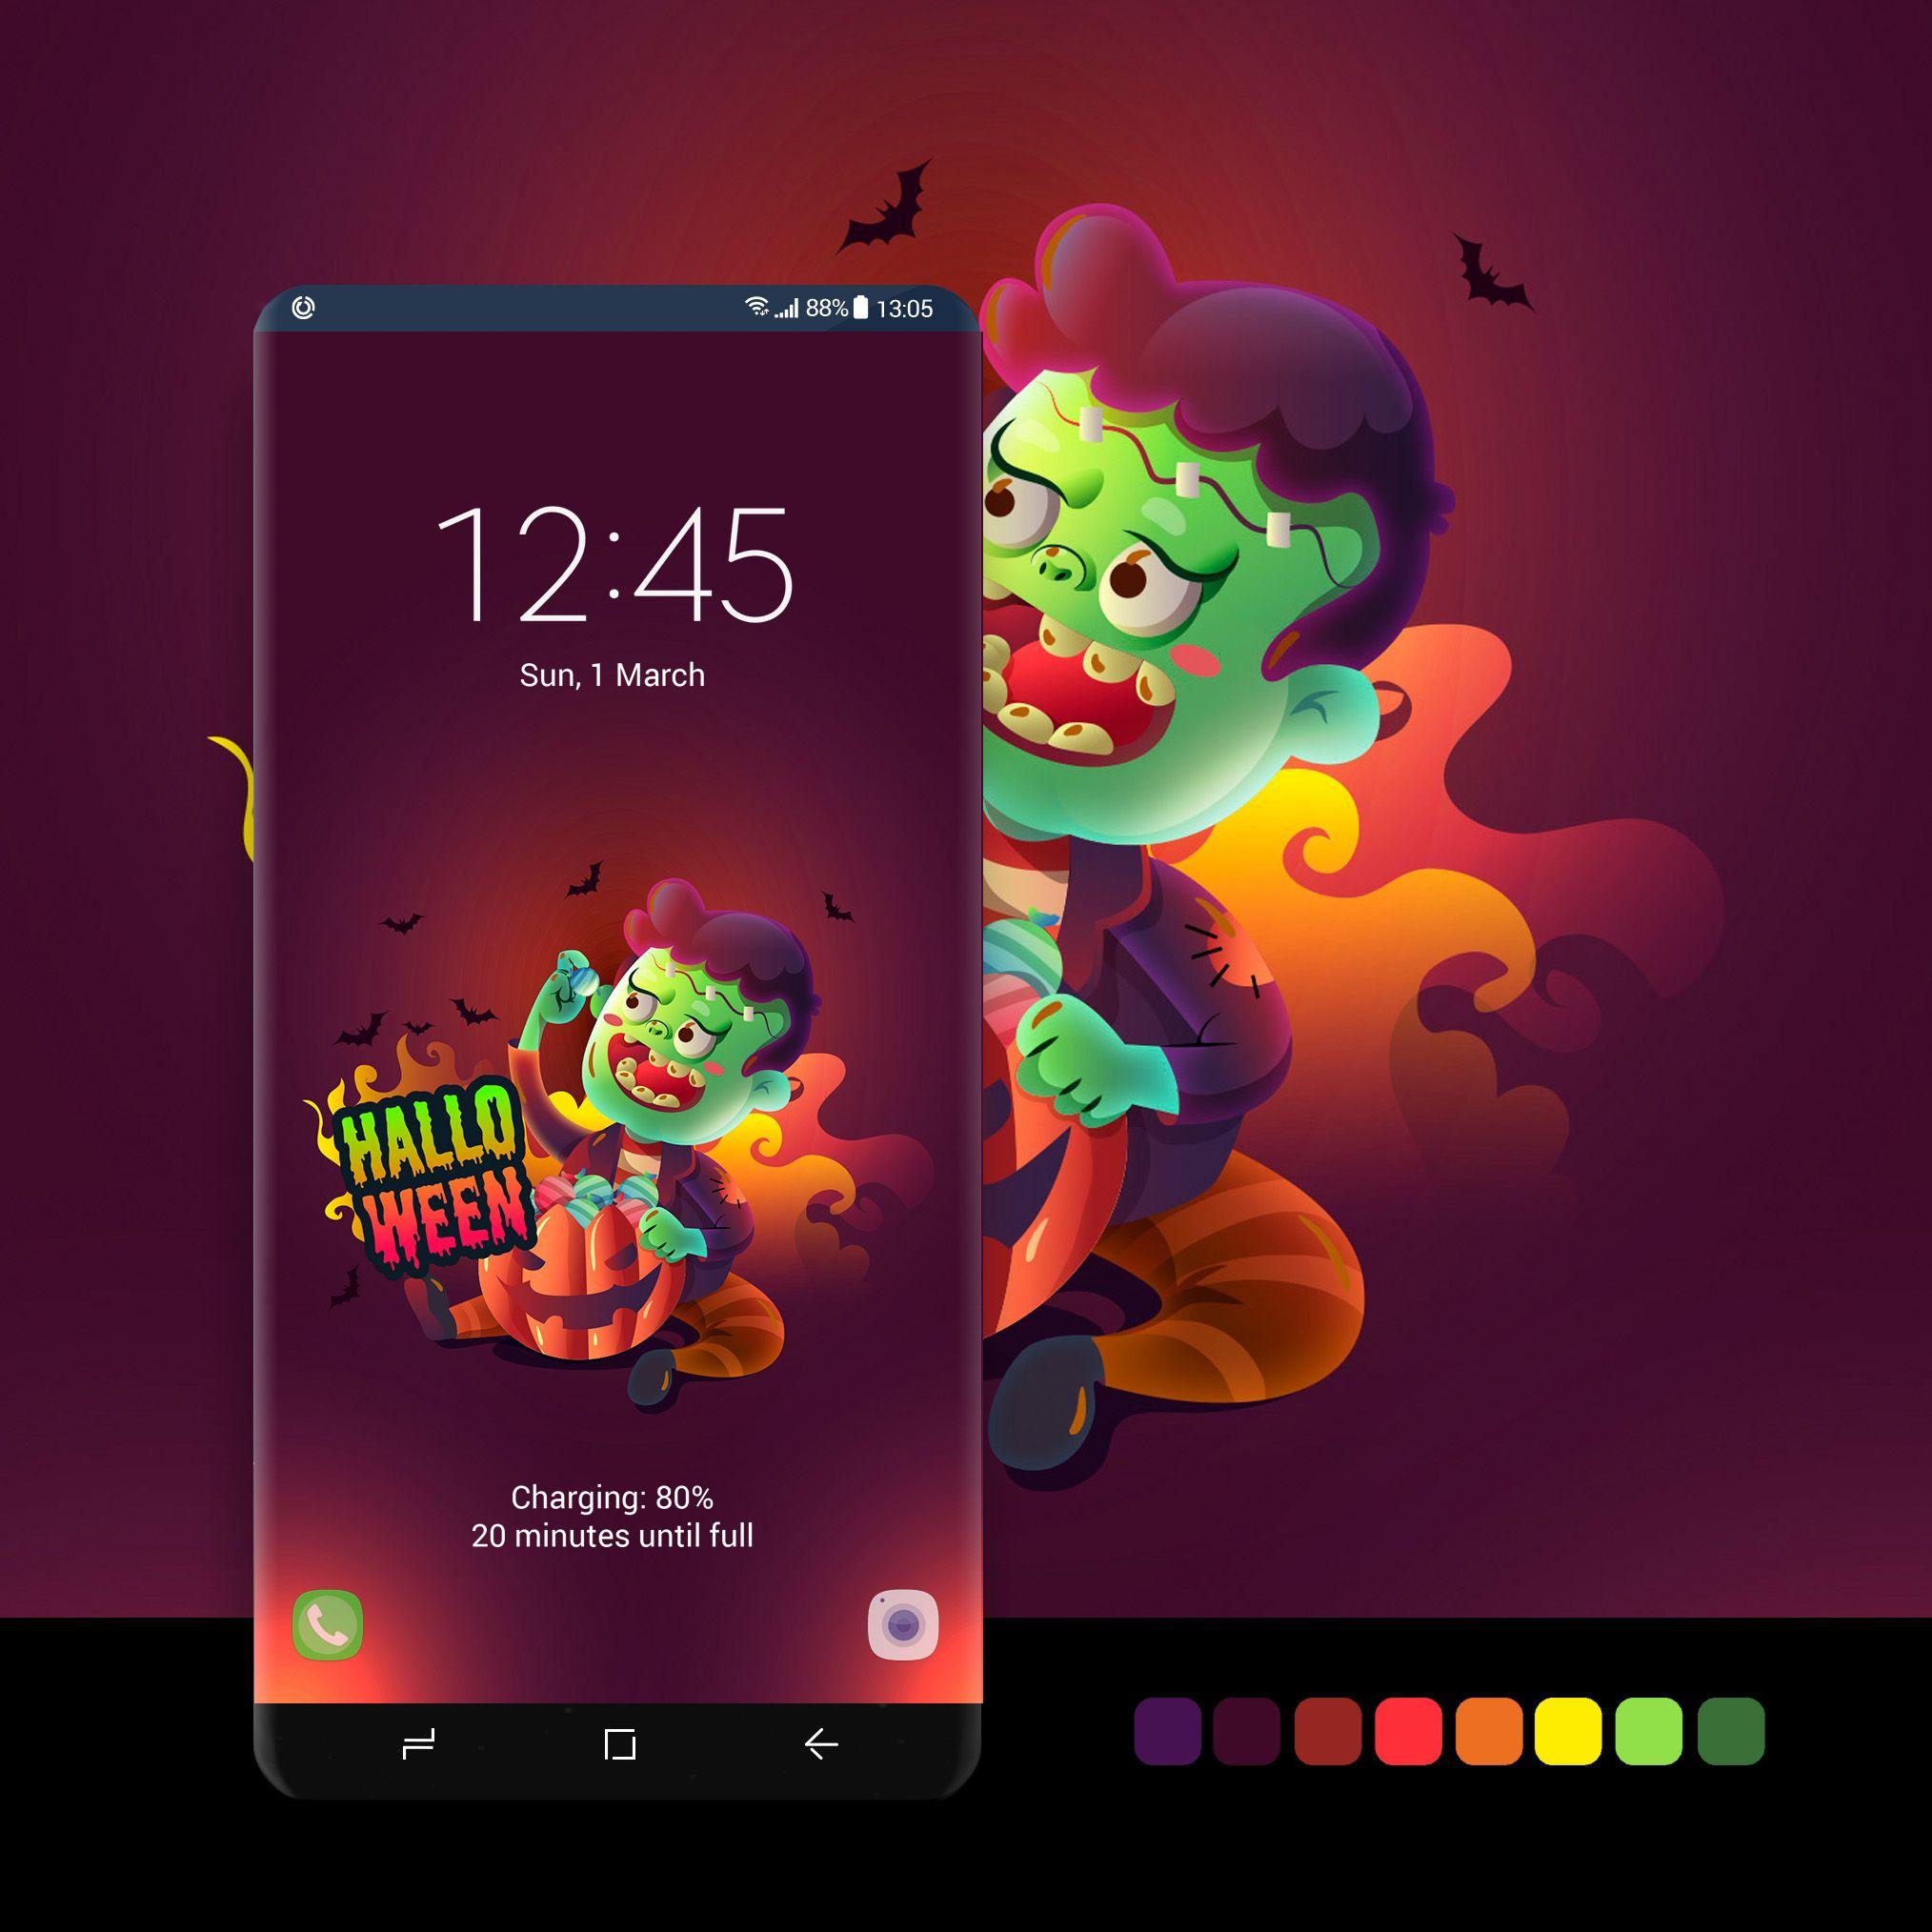 Halloween Zombie Kid Wallpaper Wallpaper Android Phone Smartphone Samsung Galaxy Samsunggalaxy Samsung Galaxy Wallpaper Galaxy Wallpaper Galaxy